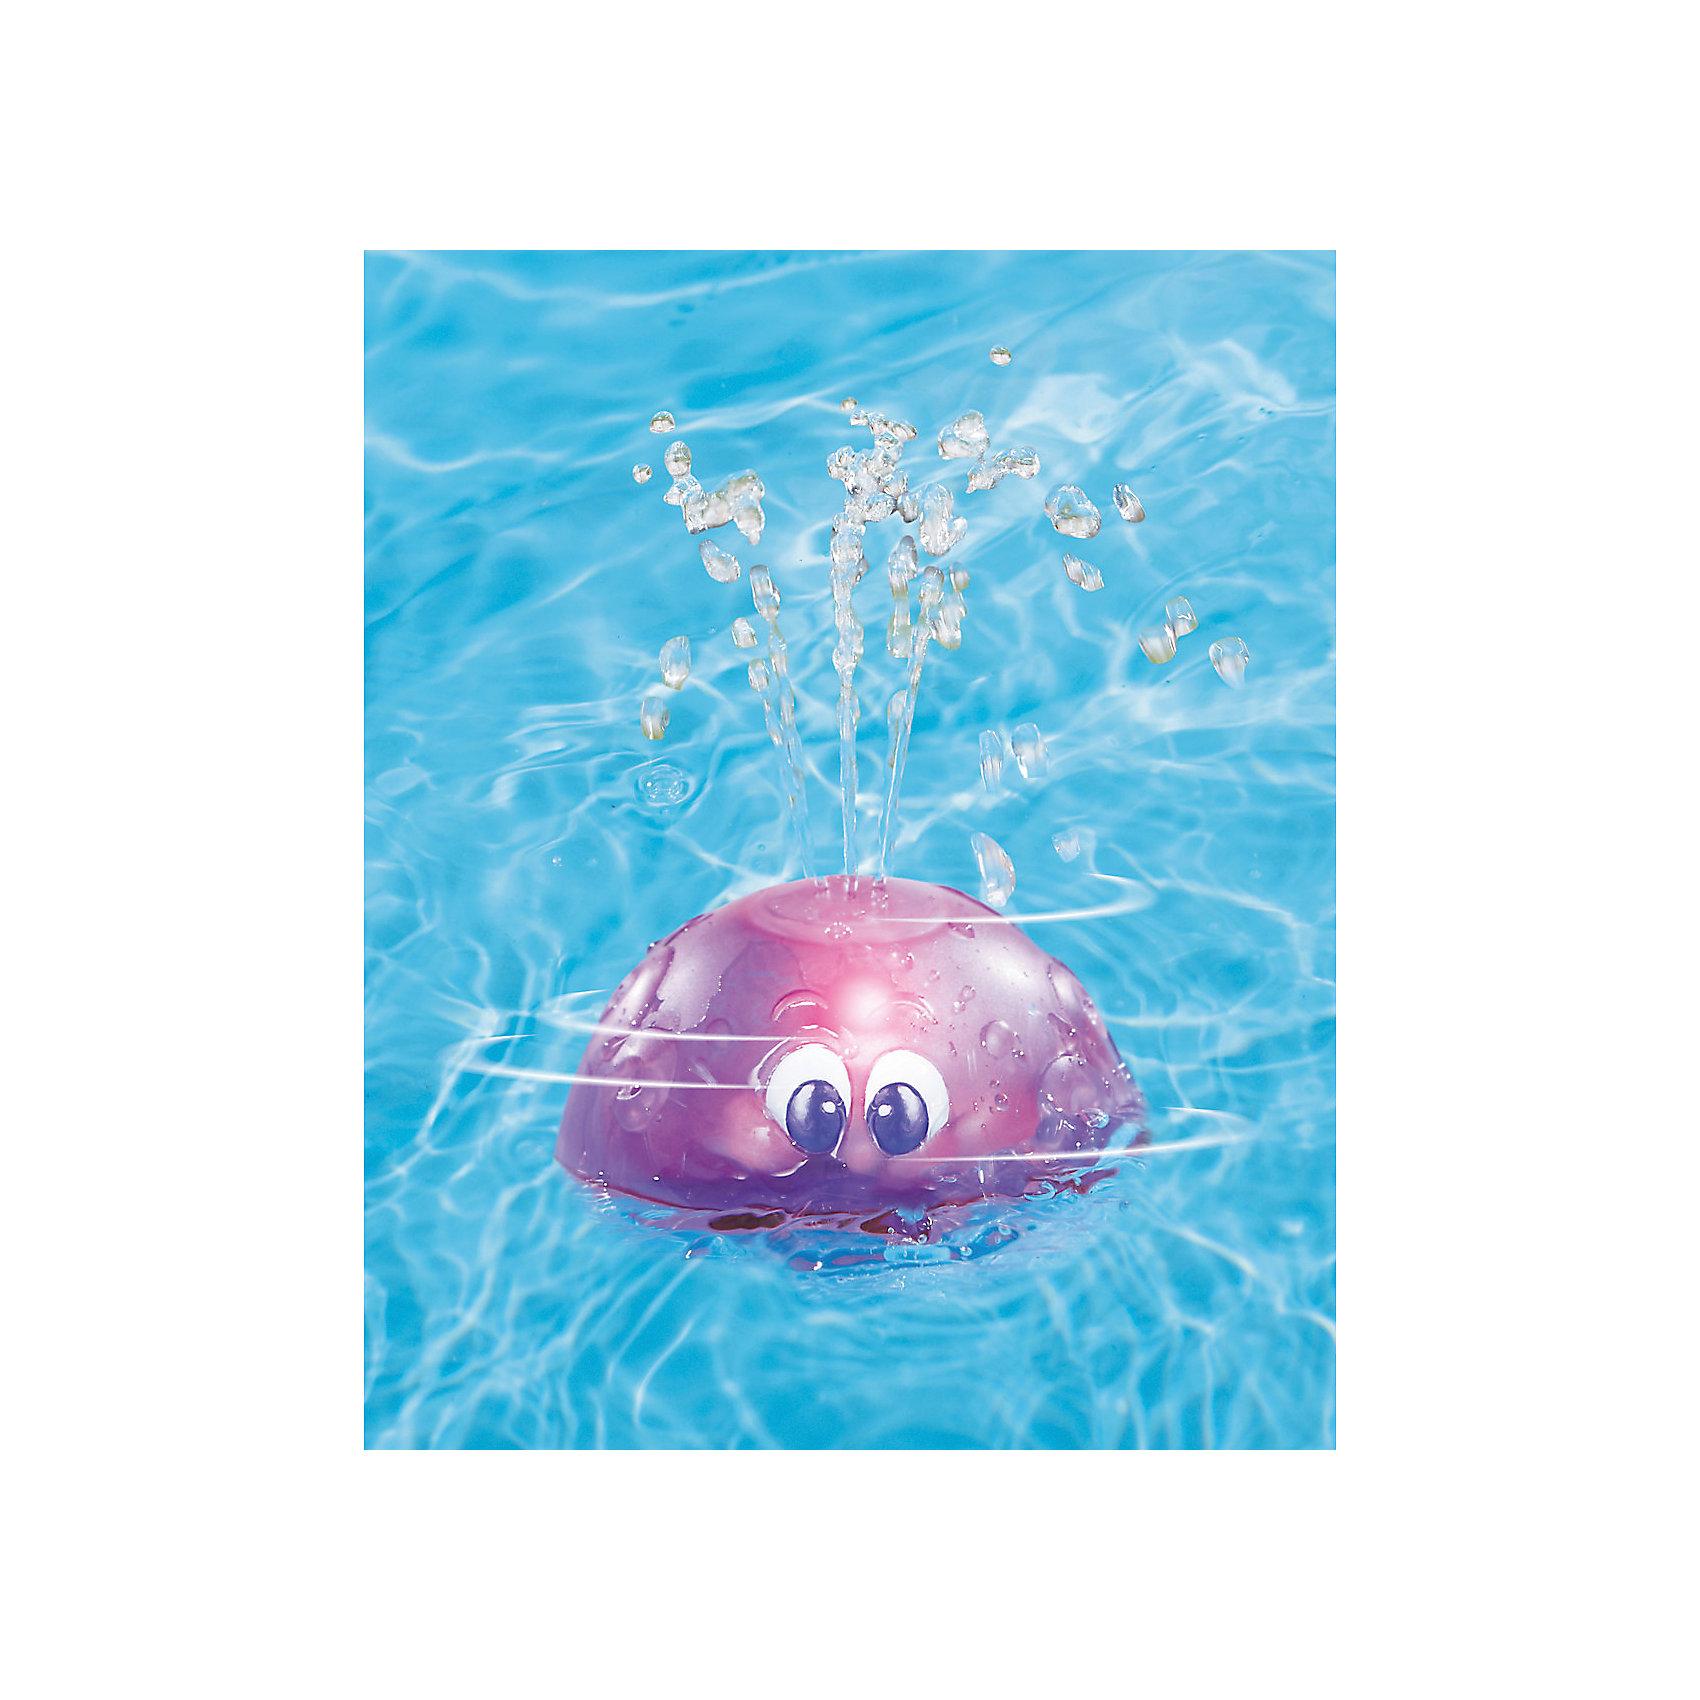 Игрушка для ванны Вращающийся фонтан, Little Tikes, фиолетовый<br><br>Ширина мм: 160<br>Глубина мм: 140<br>Высота мм: 110<br>Вес г: 257<br>Возраст от месяцев: 36<br>Возраст до месяцев: 2147483647<br>Пол: Унисекс<br>Возраст: Детский<br>SKU: 5140210